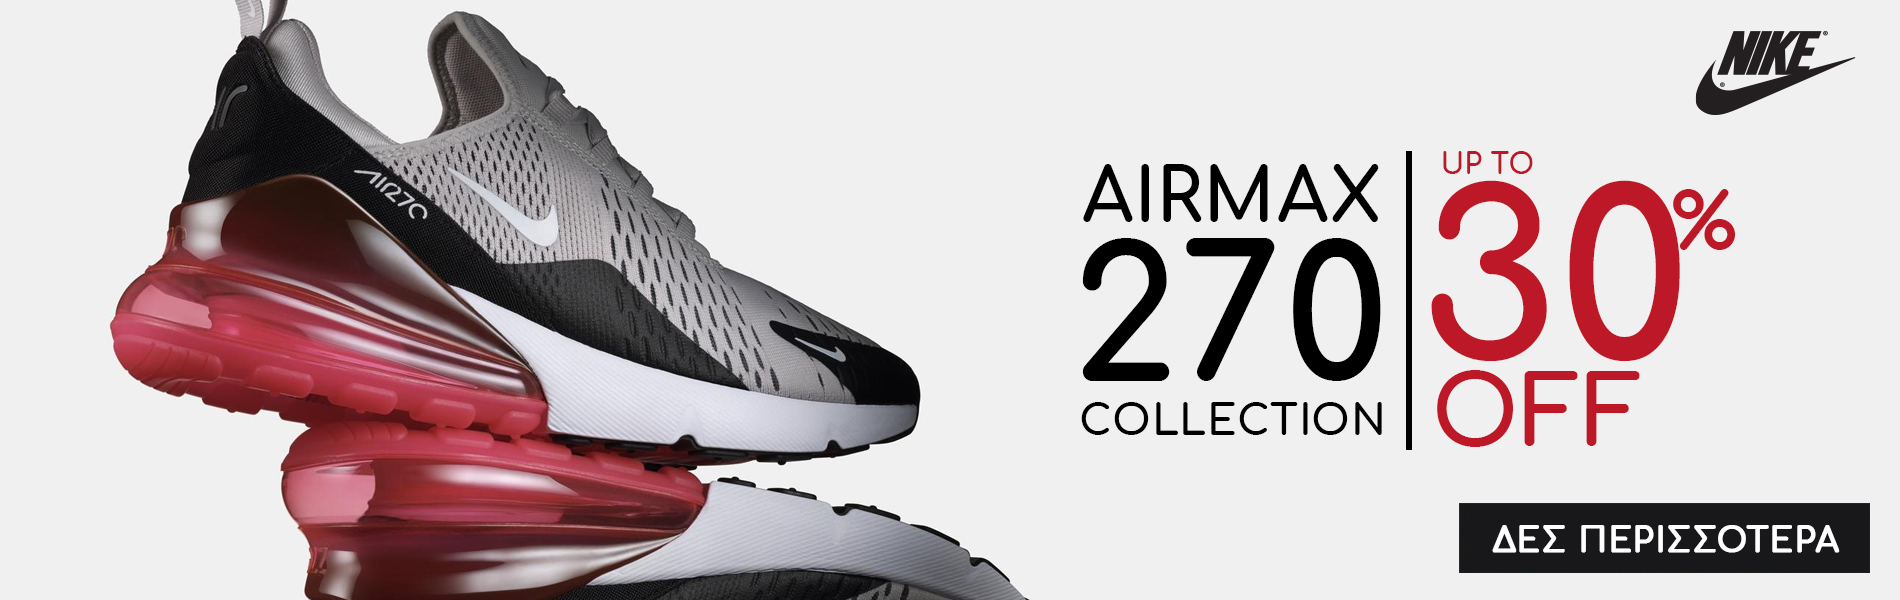 Nike Air Max 270 up to -30%